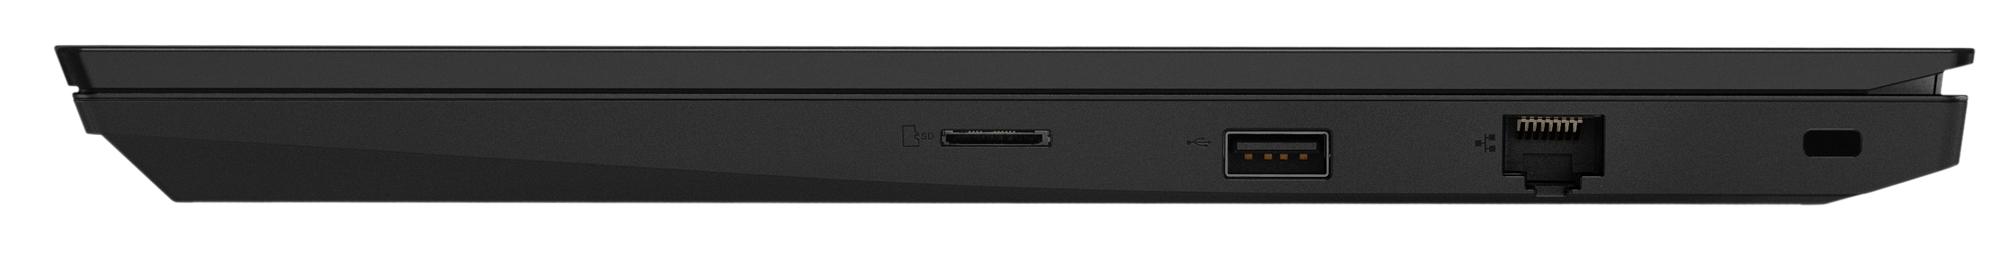 Фото  Ноутбук ThinkPad E480 (20KN005CRT)